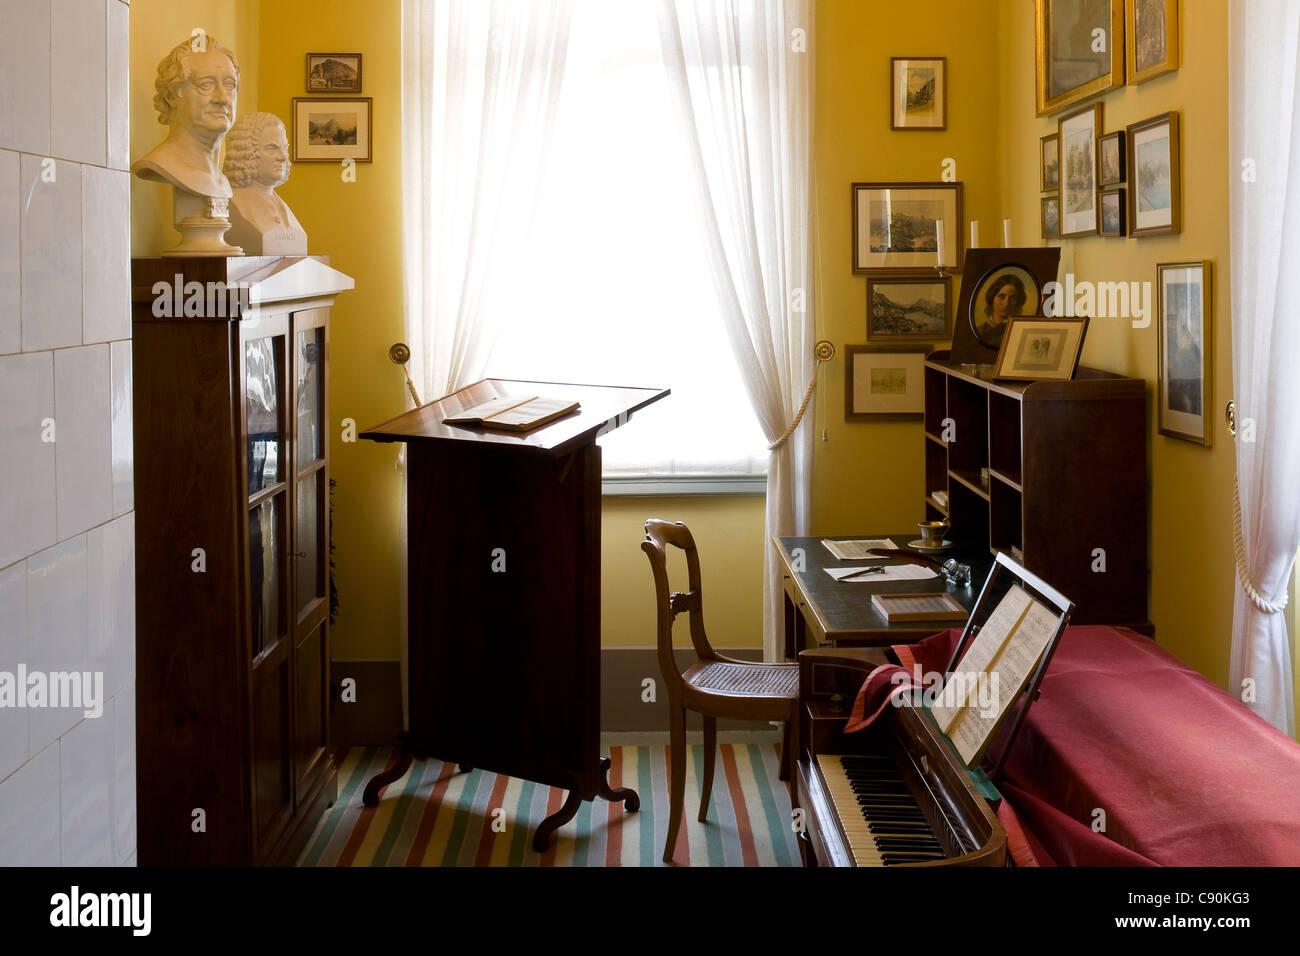 Étudier à la maison Mendelssohn dans Goldschmidtstrasse, Leipzig, Saxe, Allemagne, Europe Photo Stock